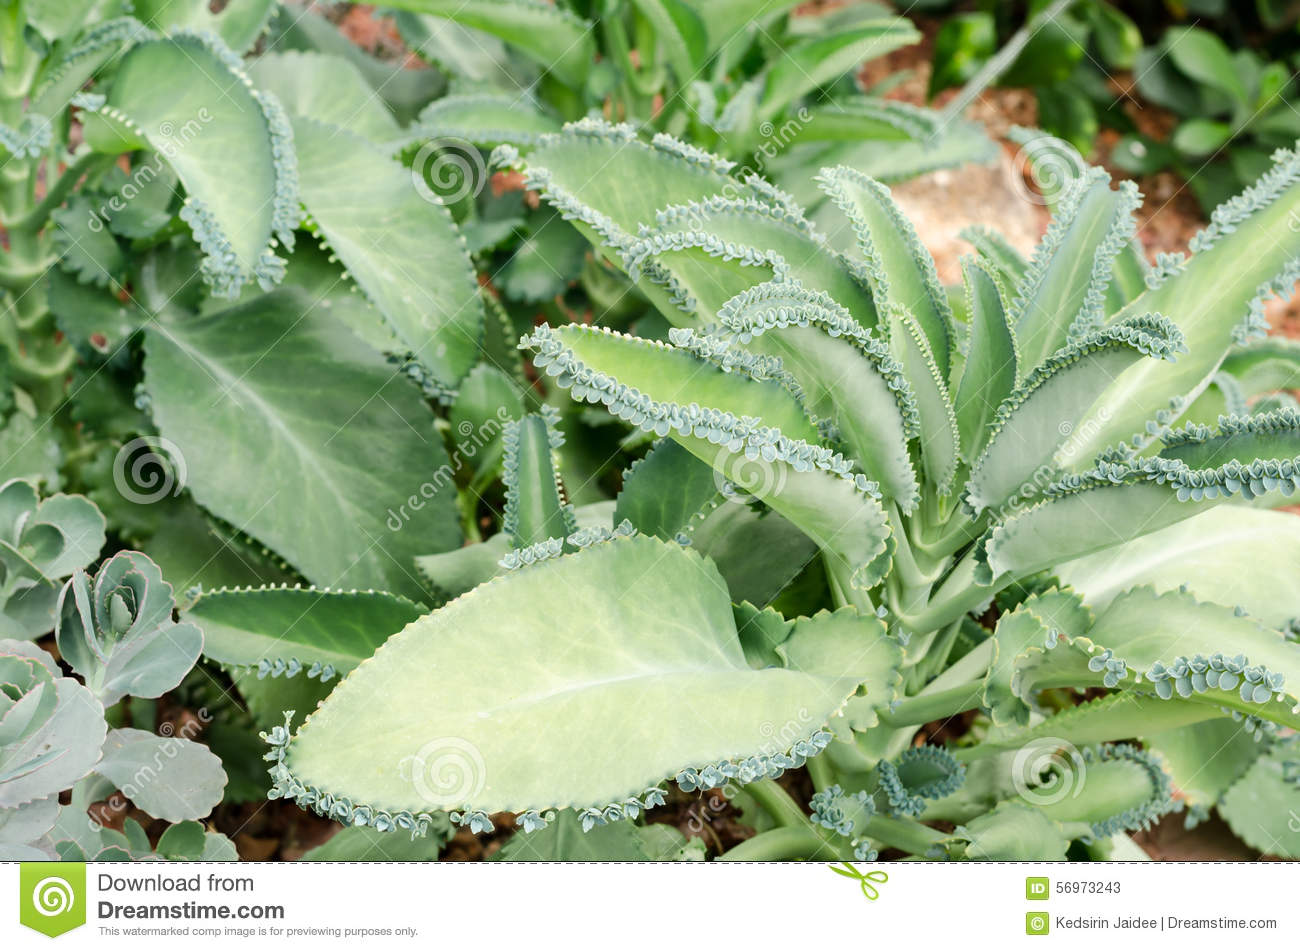 Kalanchoe Pinnata,Succulent Plants In Garden Stock Photo.